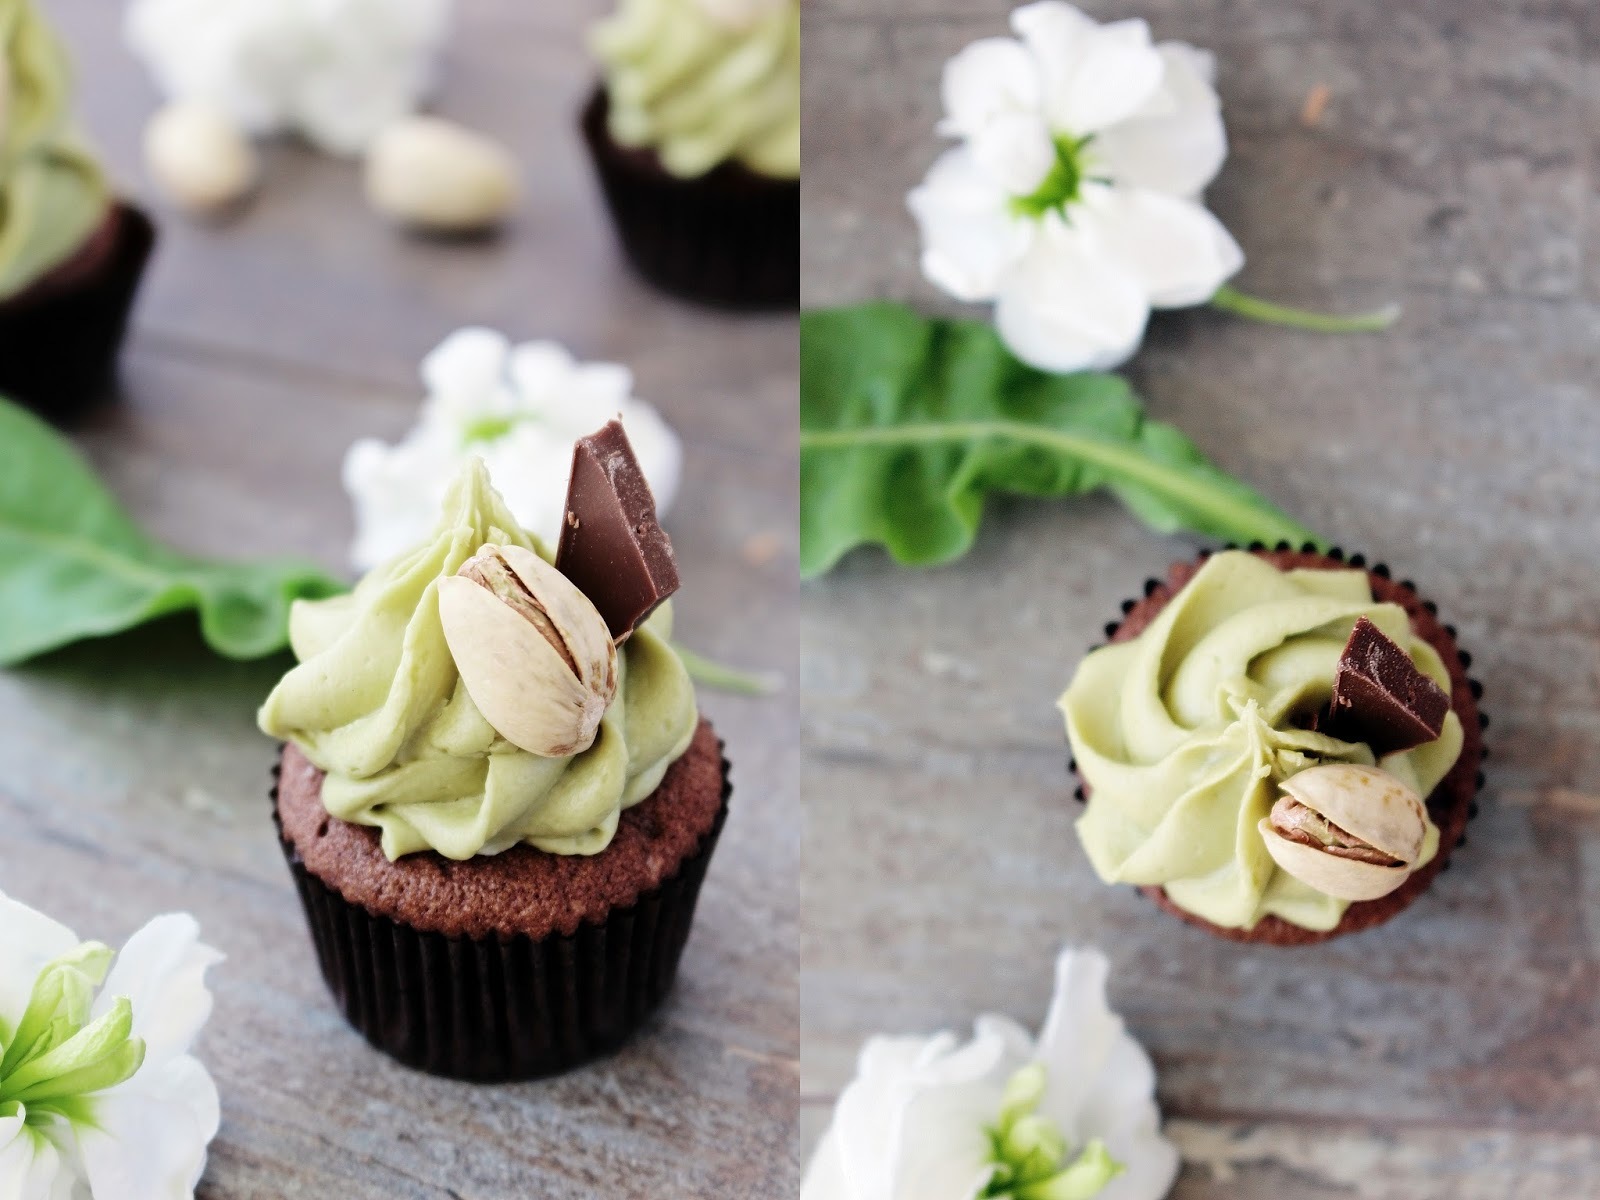 Schokoladen Pistazien Minicupcakes_2